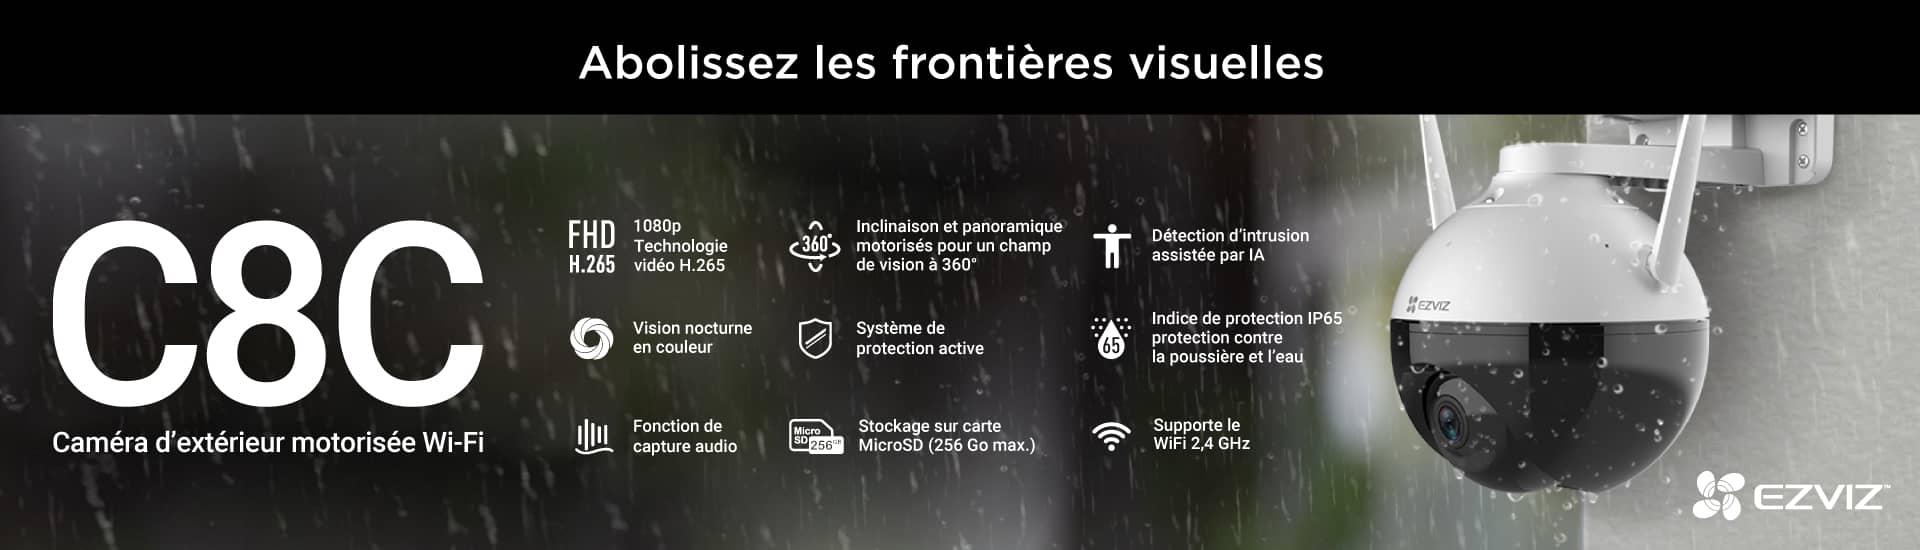 C8C Ezviz - Caméra d'extérieur motorisée Wi-Fi